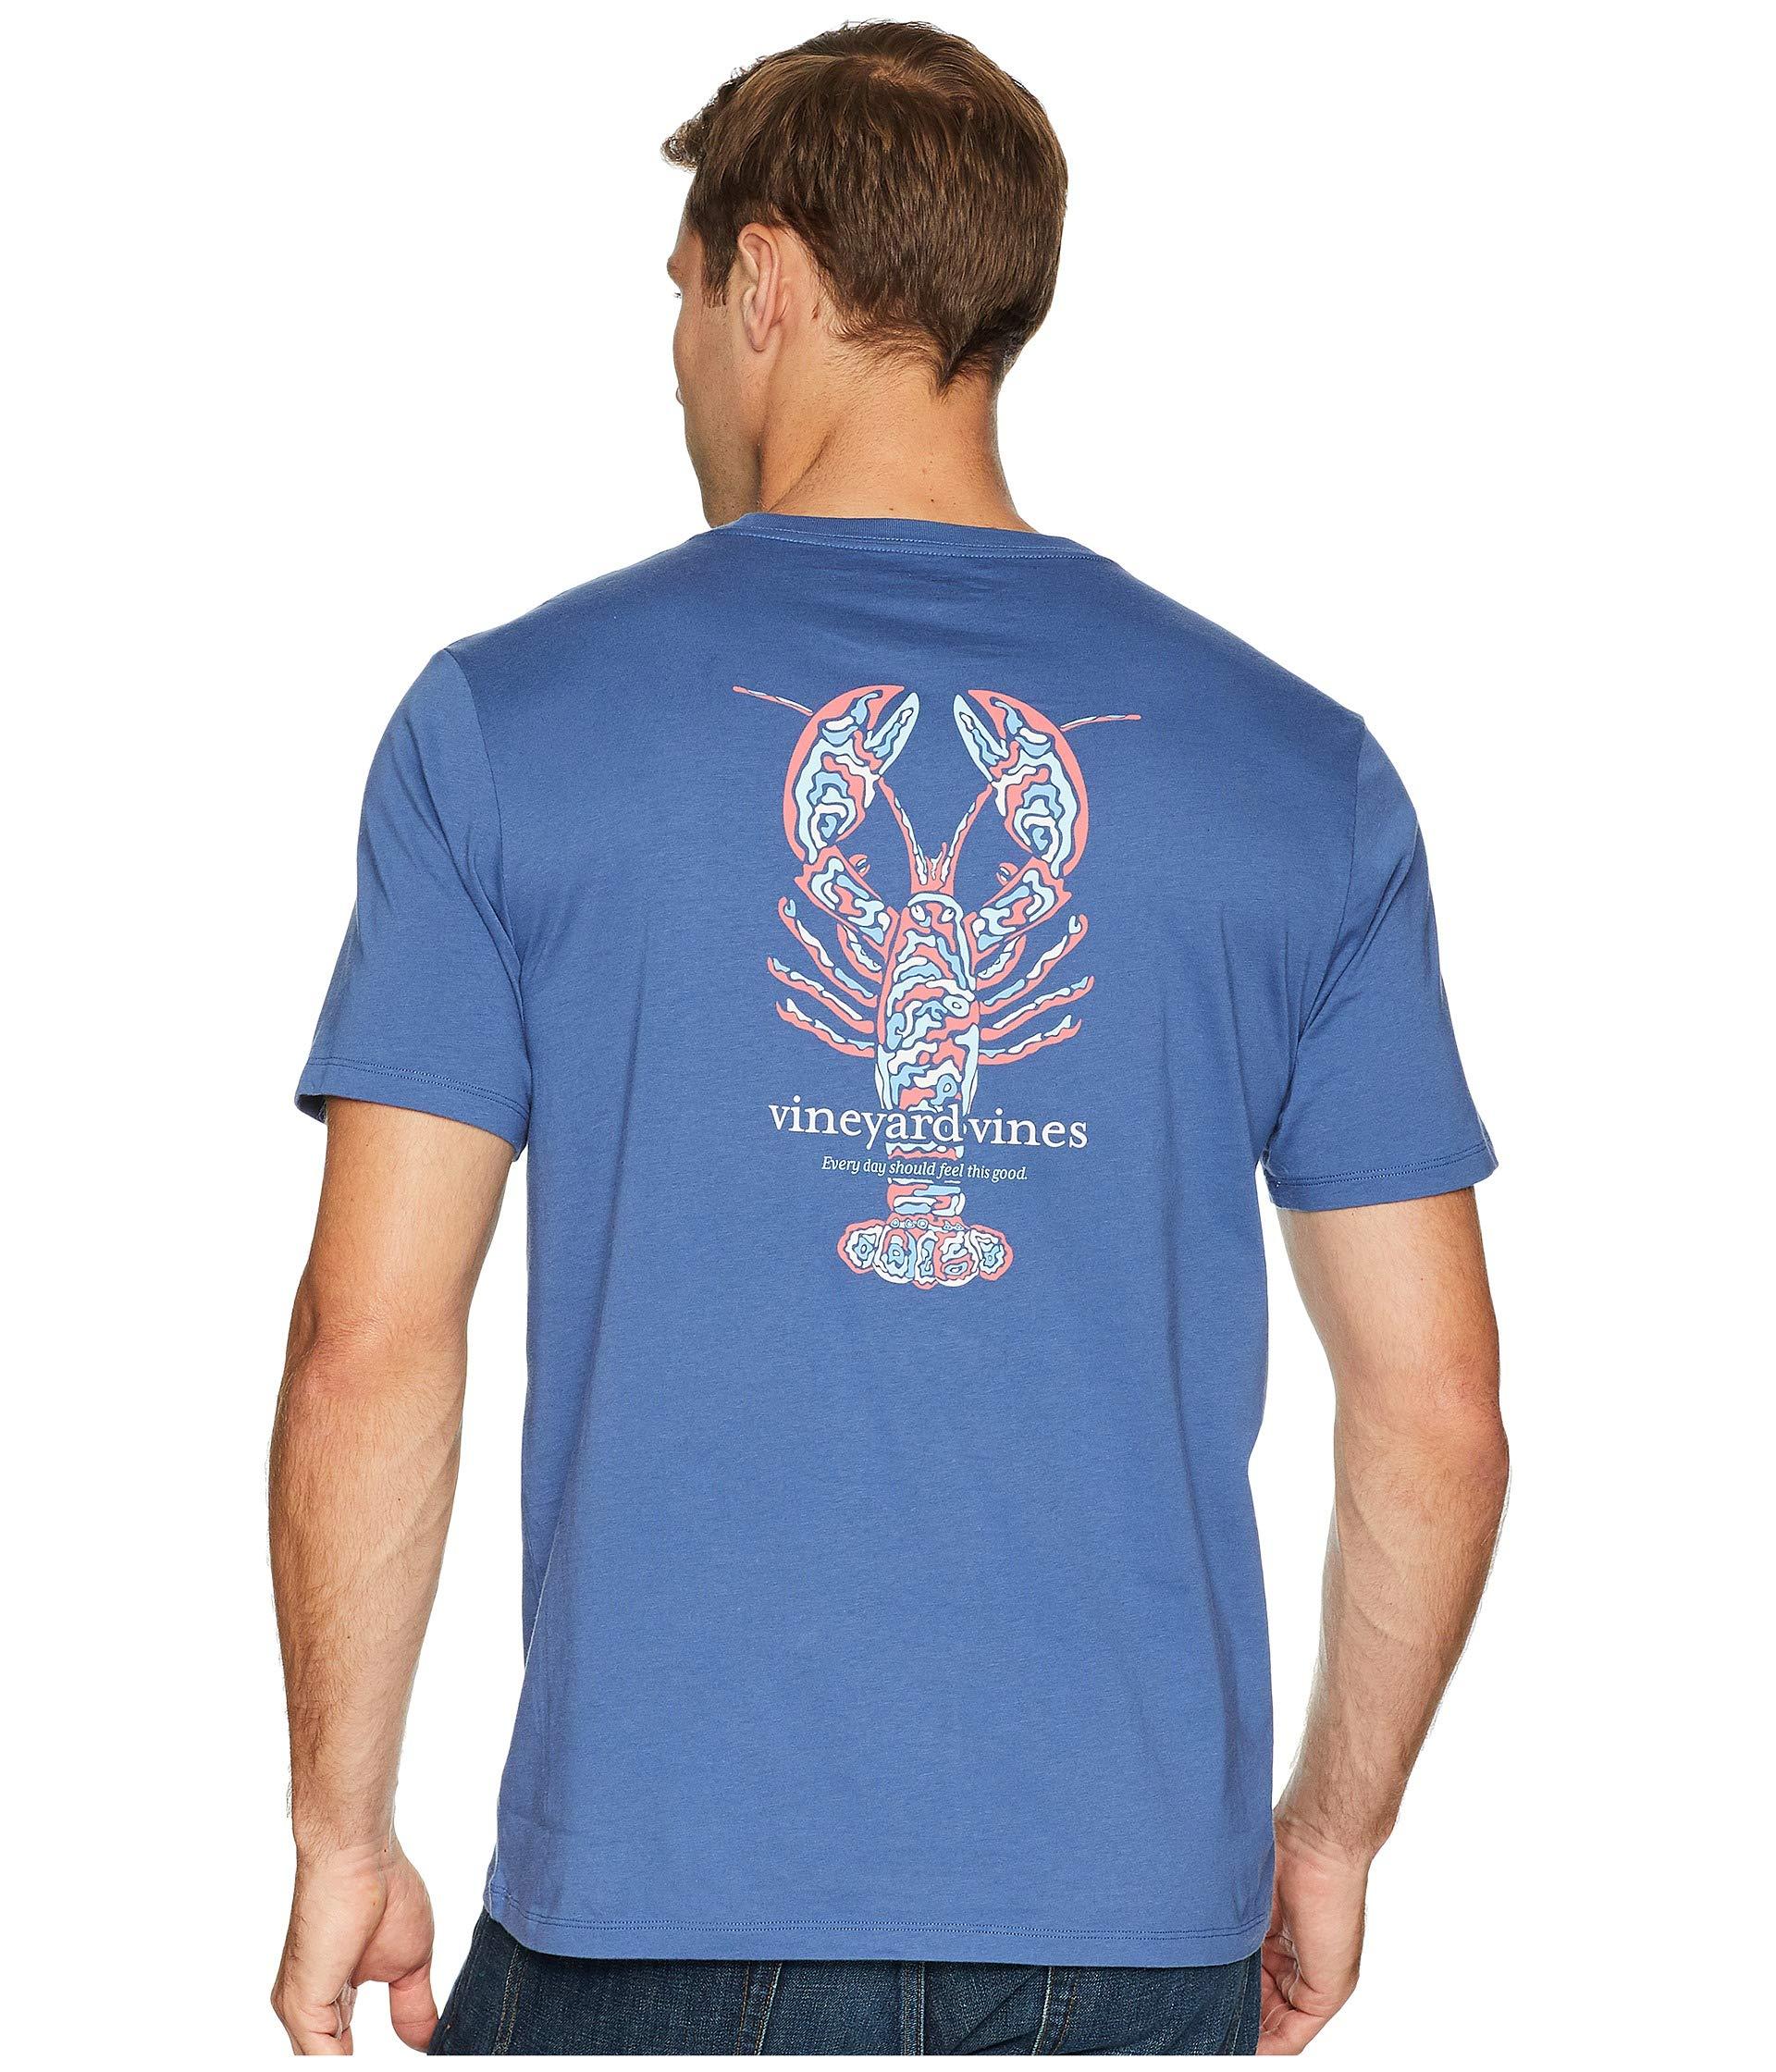 Tee Camo Sleeve Vines Vineyard Short Lobster Moonshine Pocket x8YtnqFw